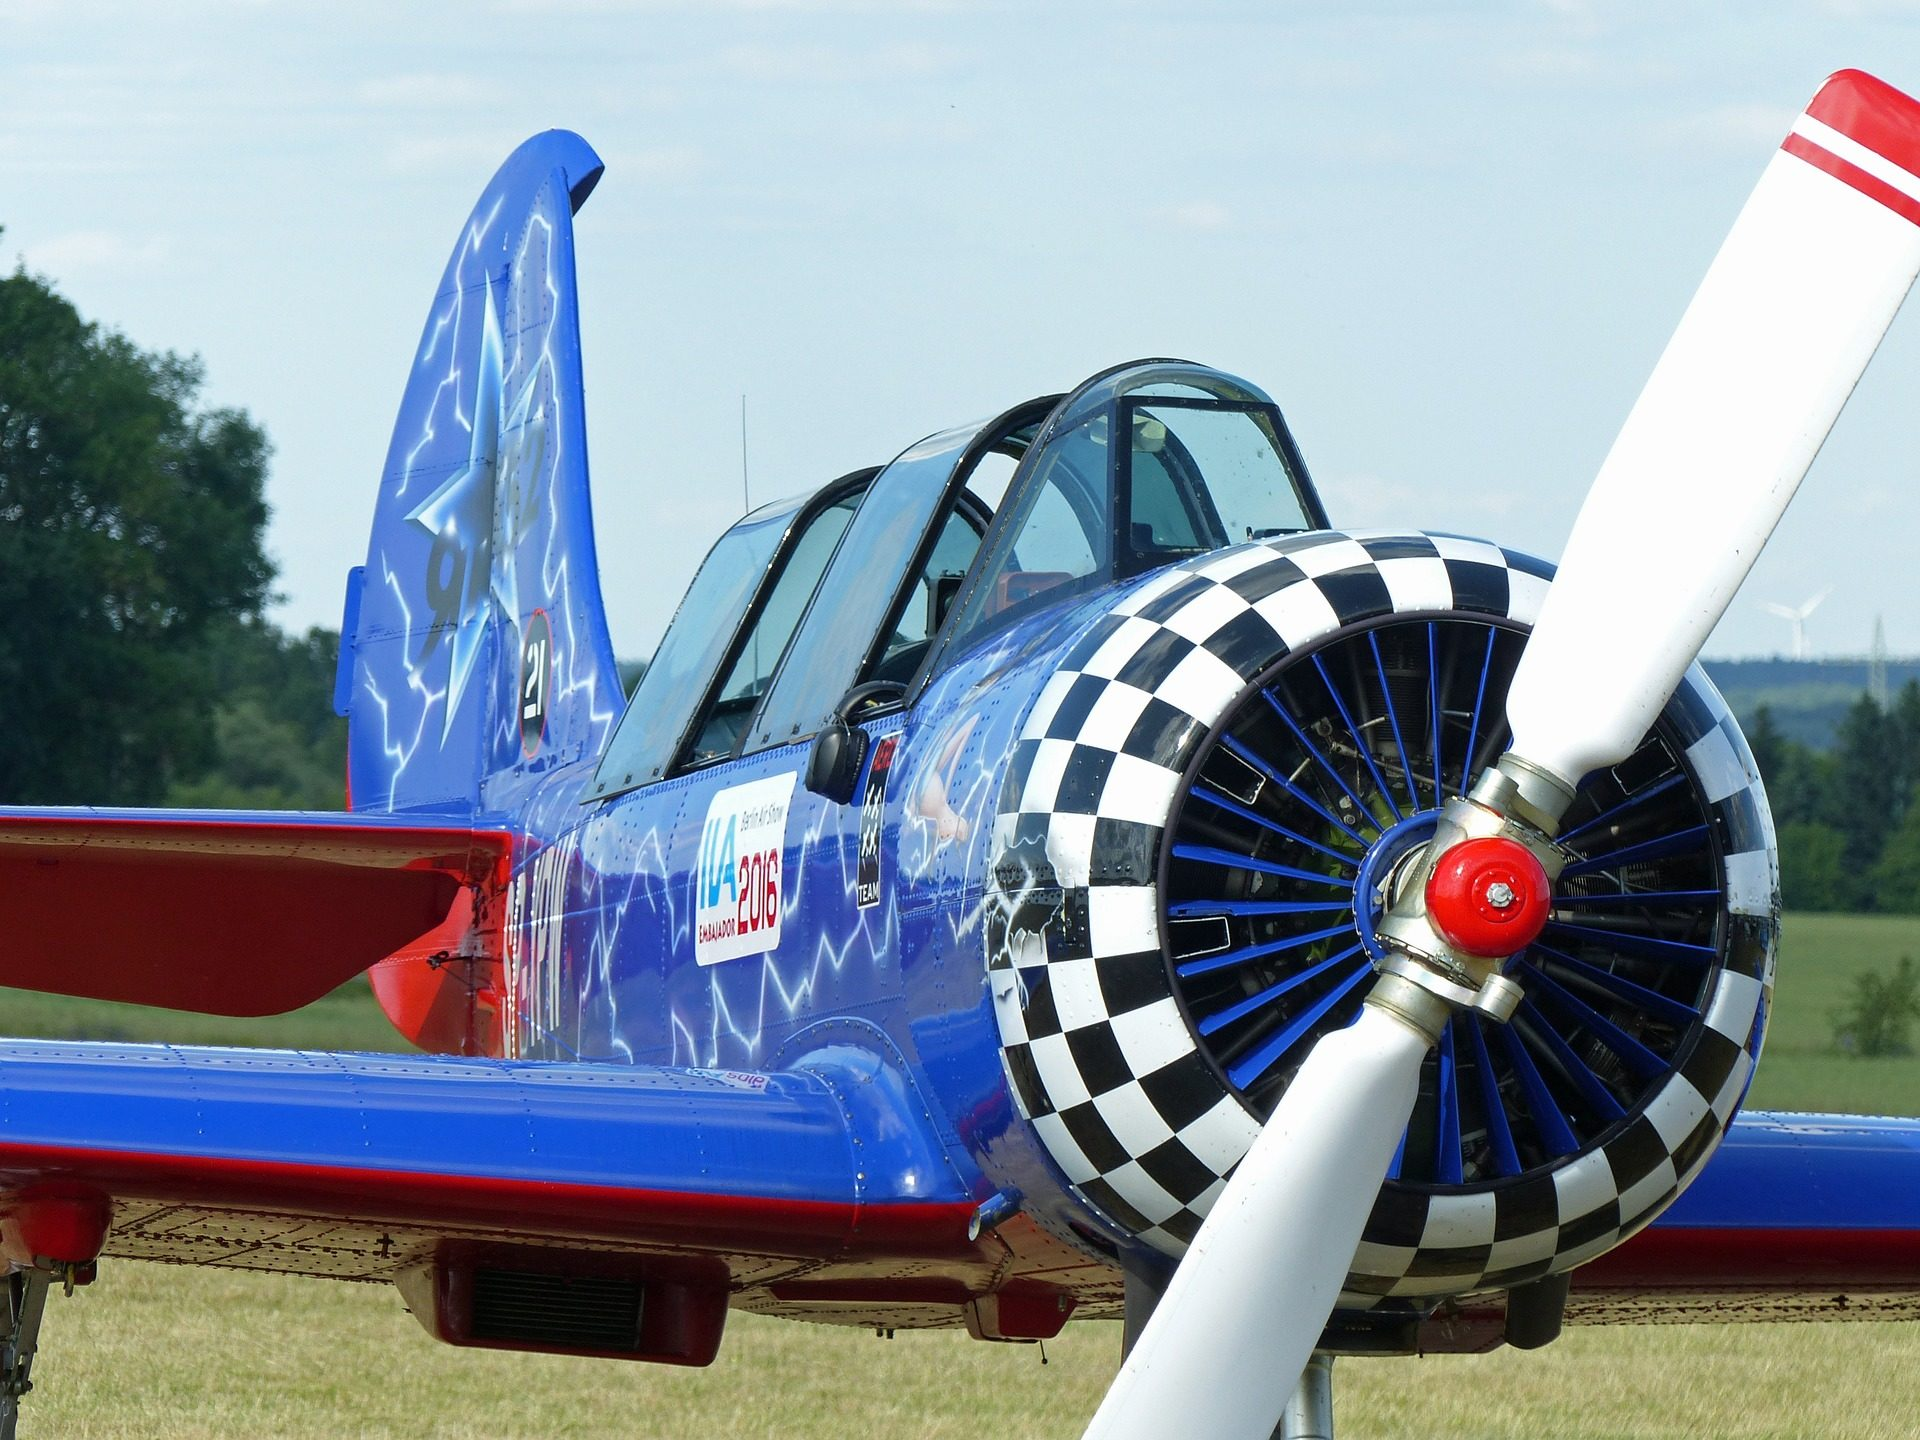 avioneta, hélice, aspas, cabina, alas, jak52 - Fondos de Pantalla HD - professor-falken.com